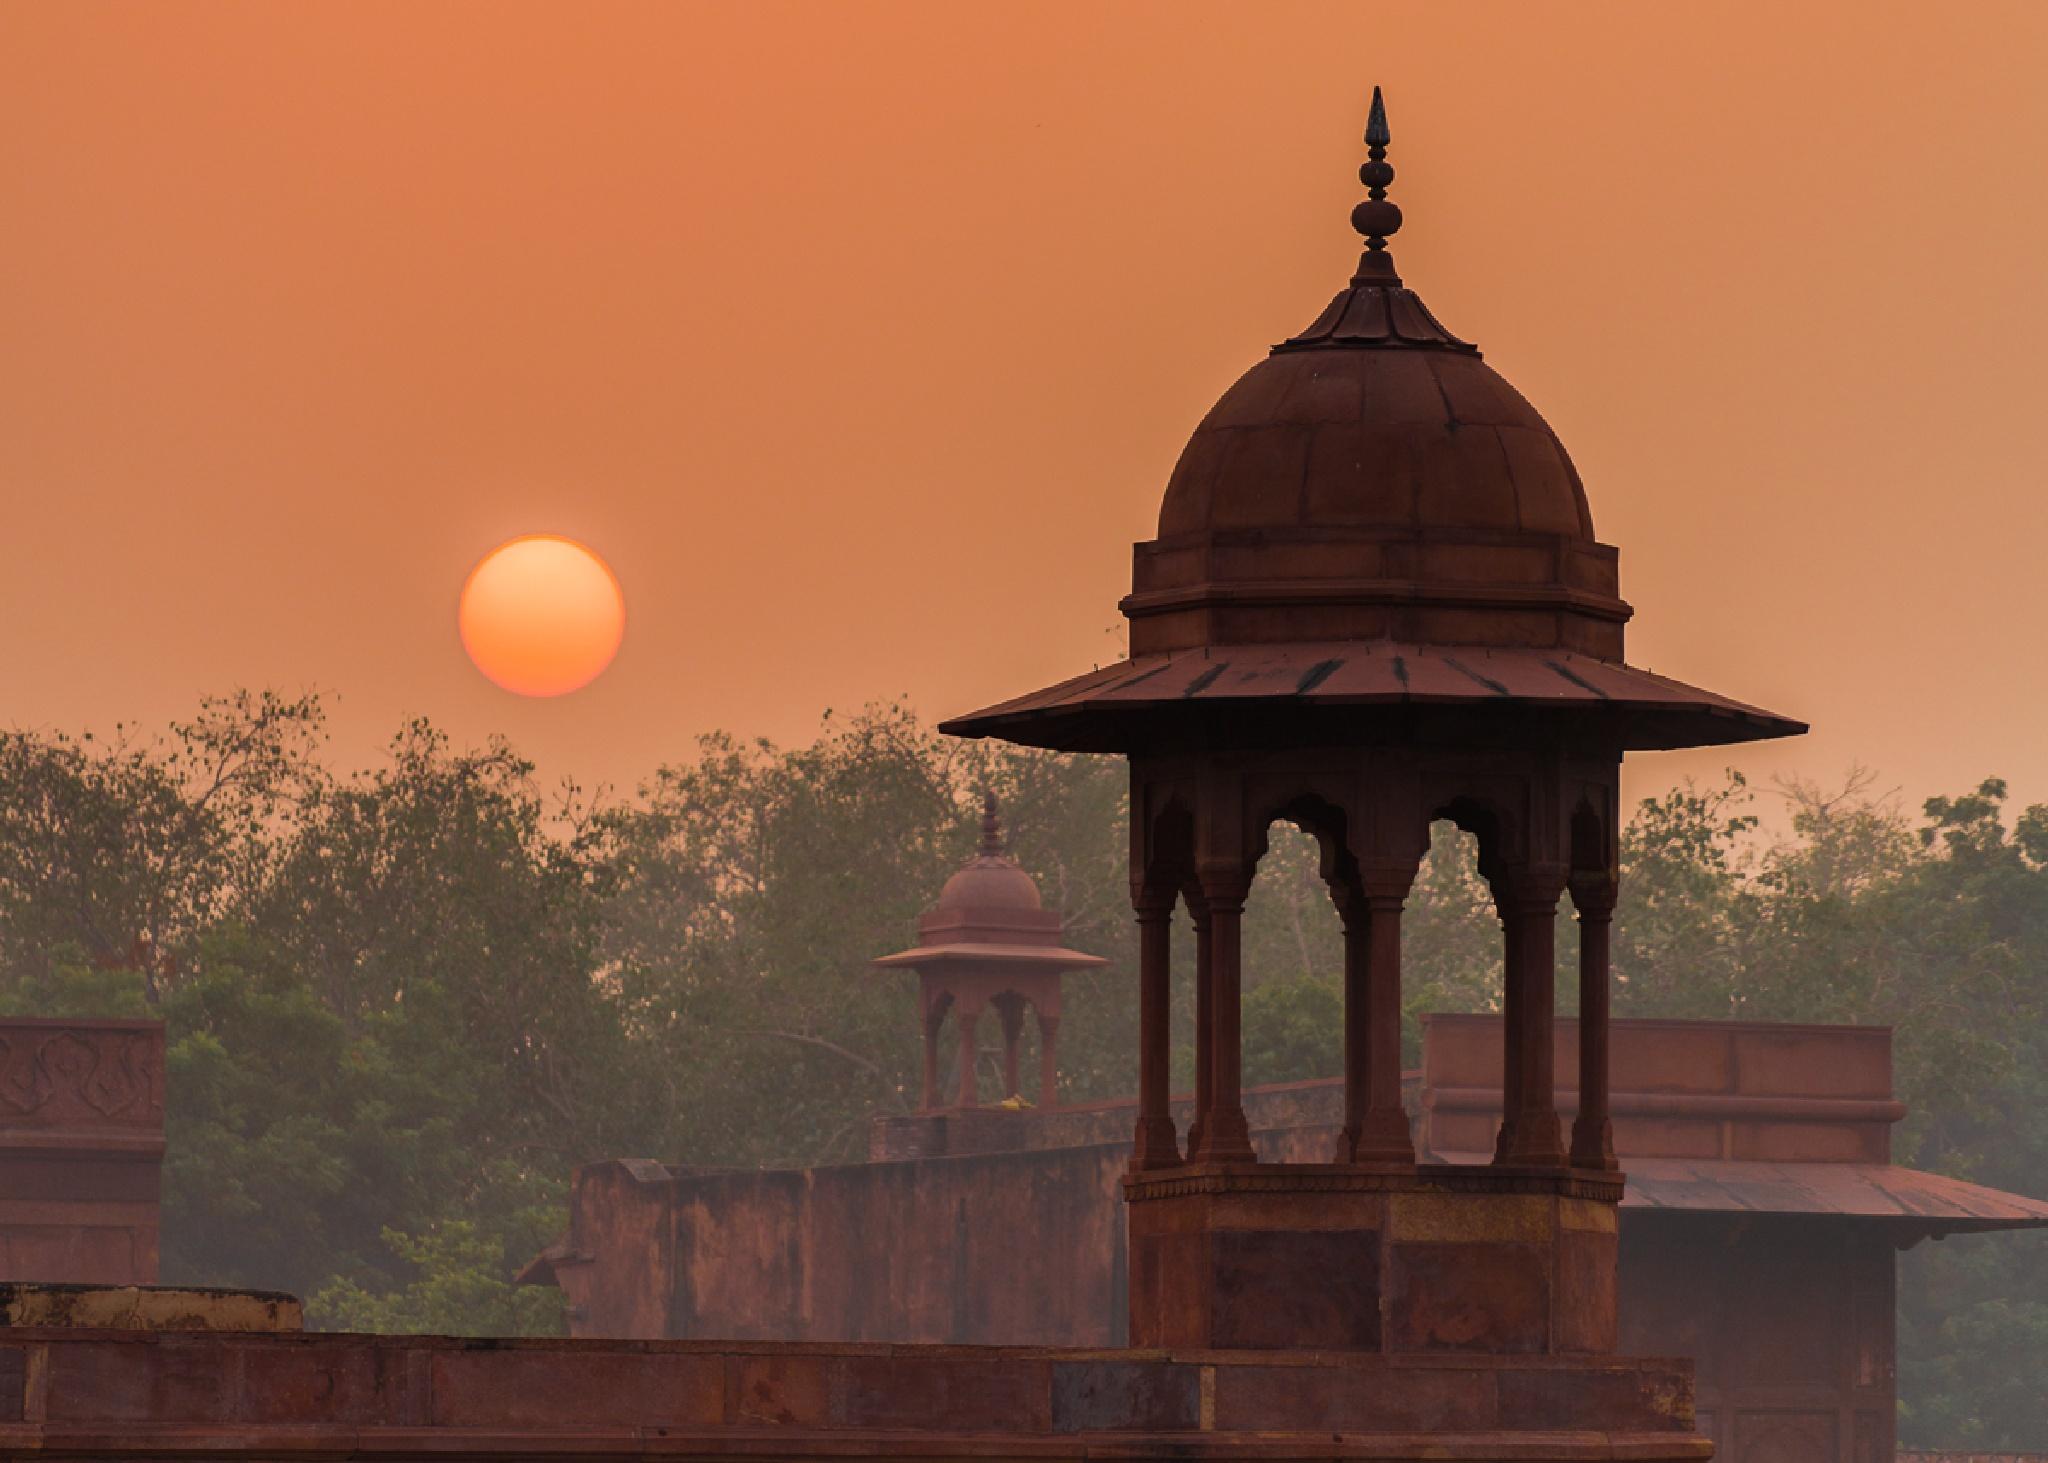 Hazy Sunrise at Agra by William Yu Photography